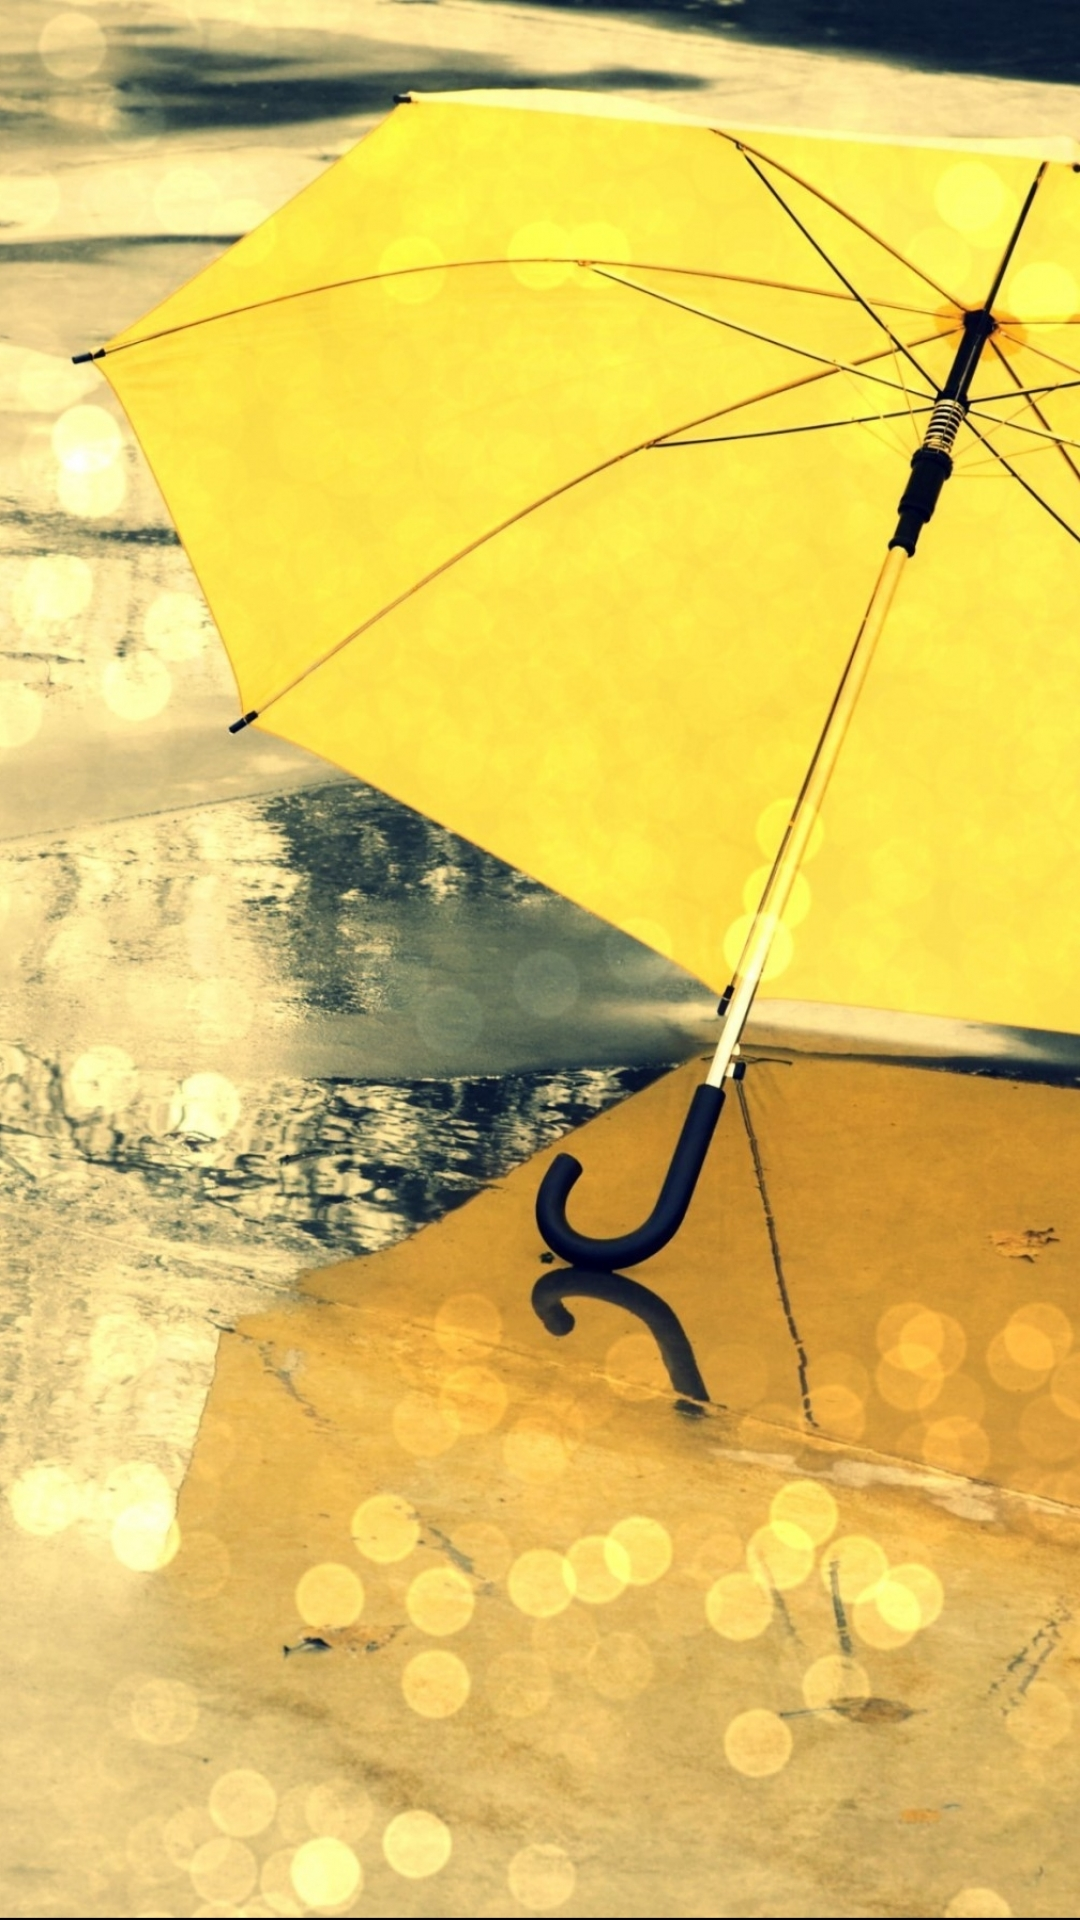 Wallpaper iphone umbrella - Check Wallpaper Abyss